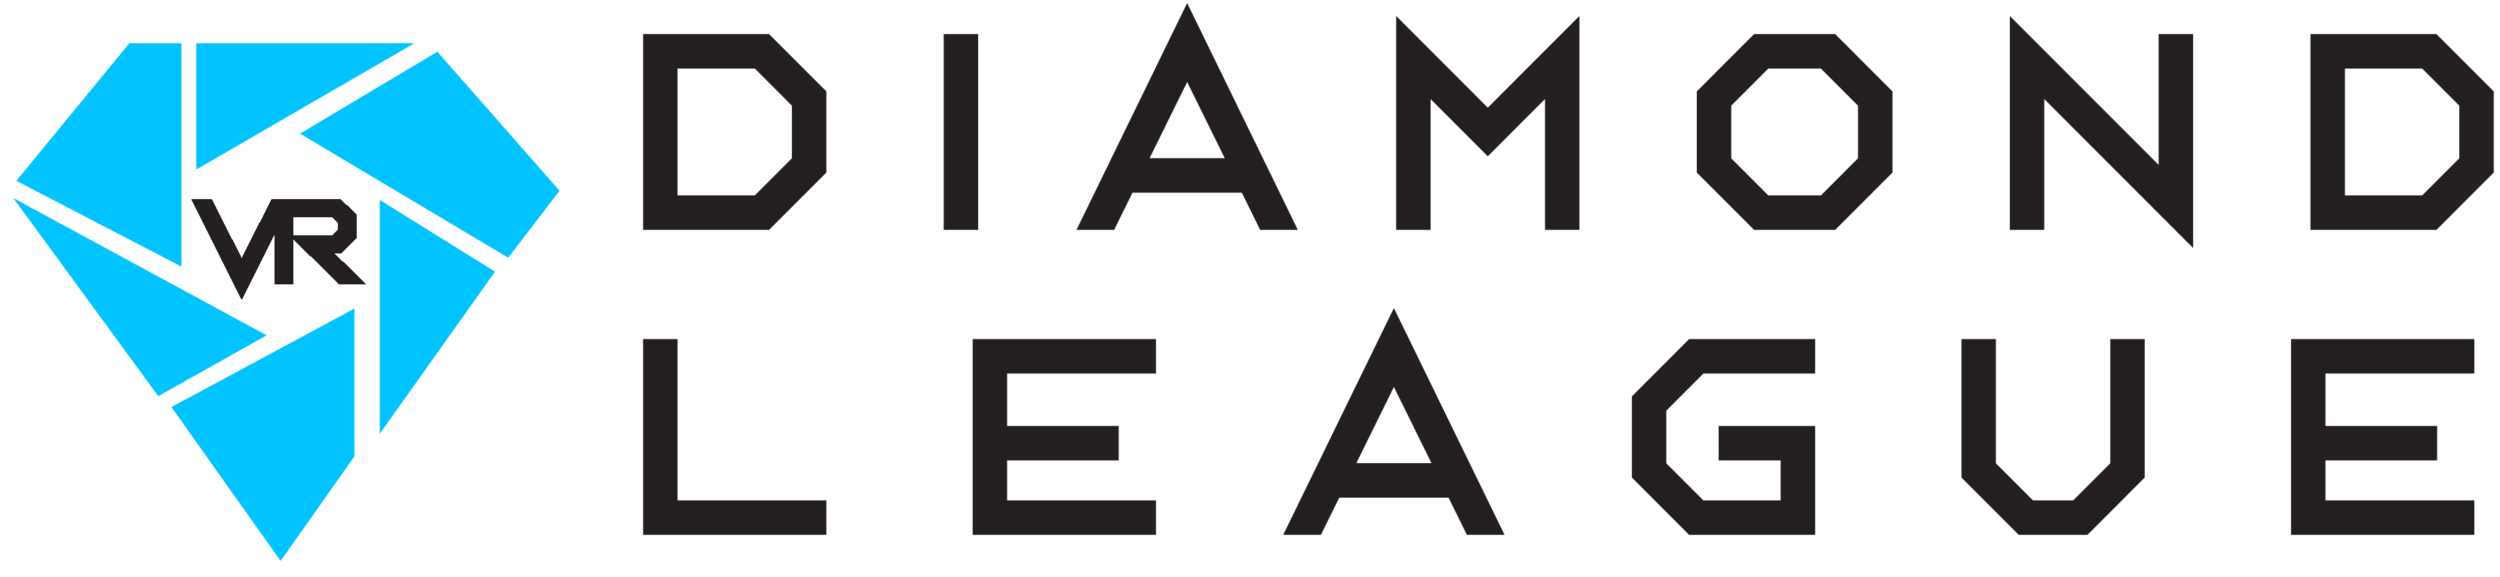 VRDL_Logo_02.png